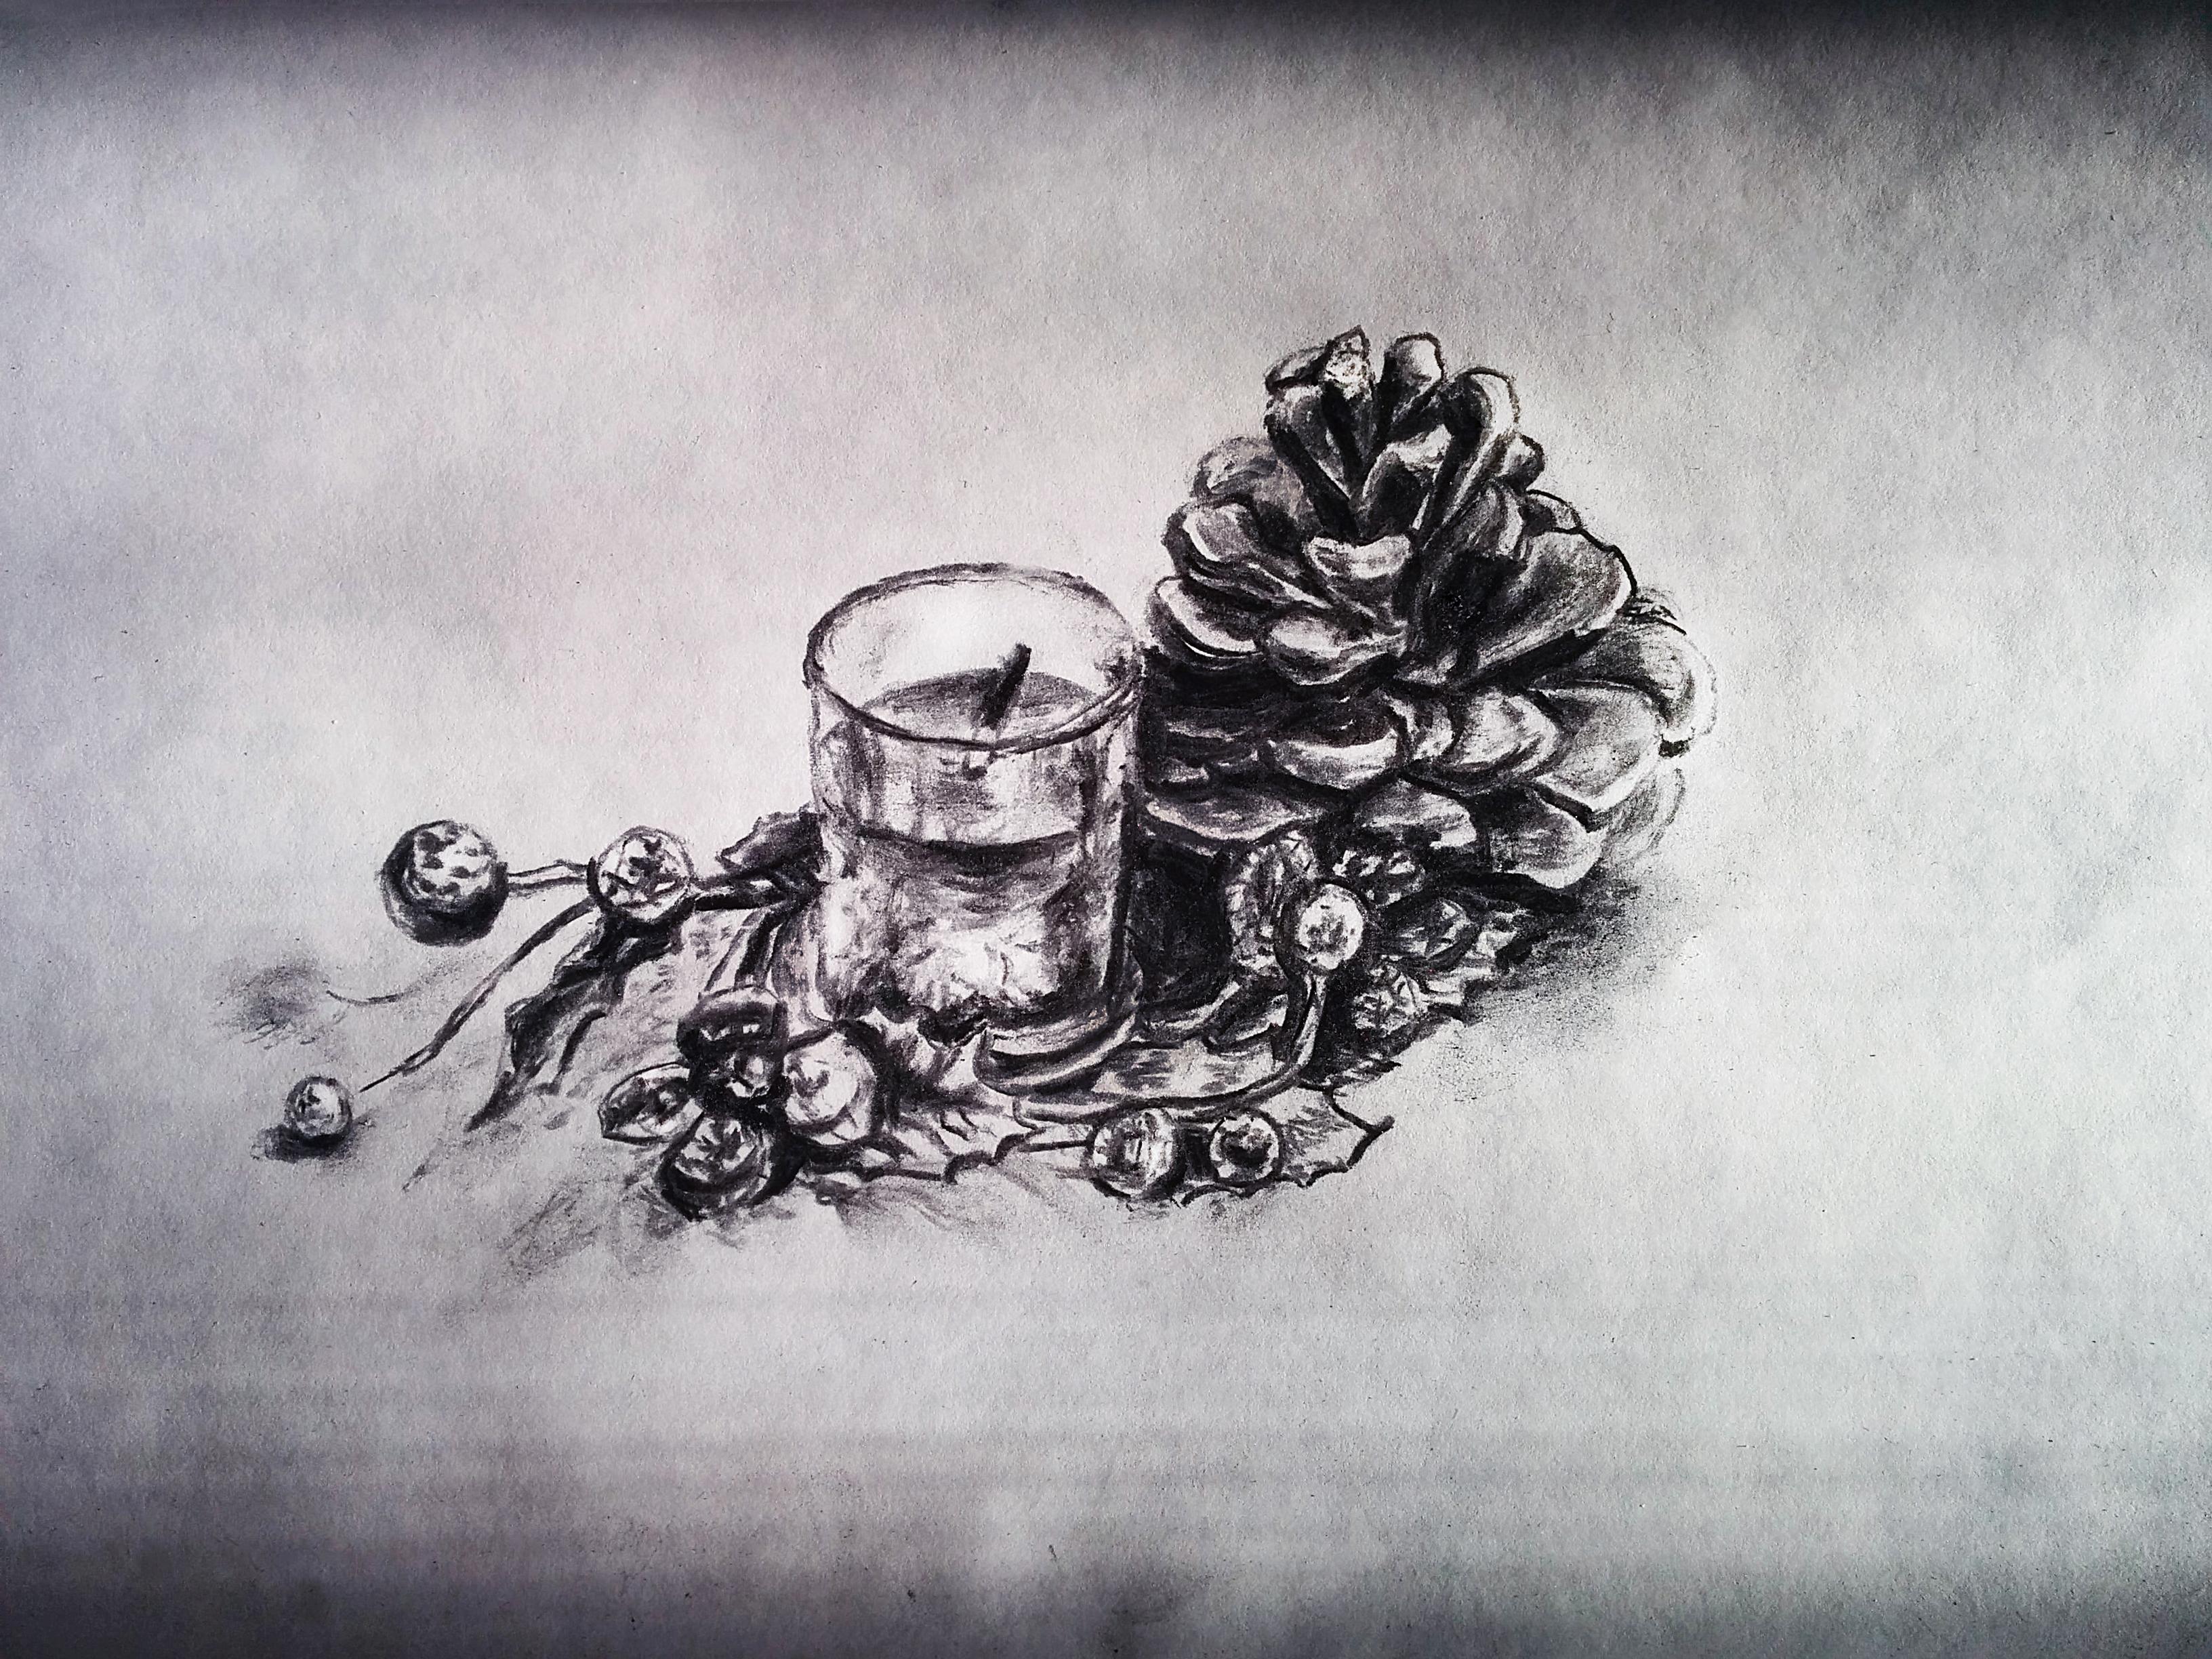 New Year's still life coal art by artist Alice Croft Новогодний натюрморт углем шишка и свеча